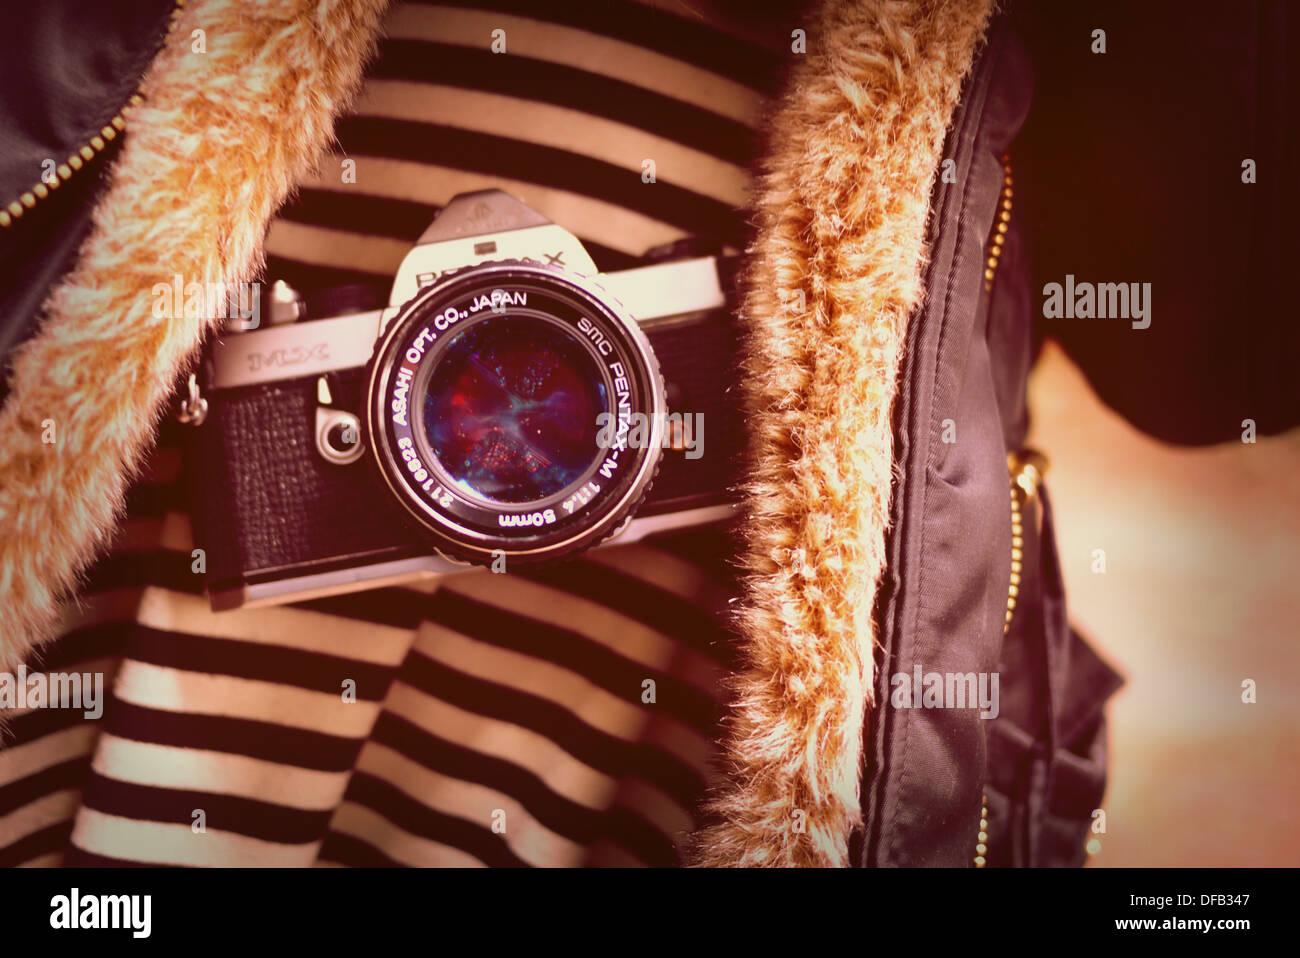 old Pentax MX camera hanging on girl - Stock Image